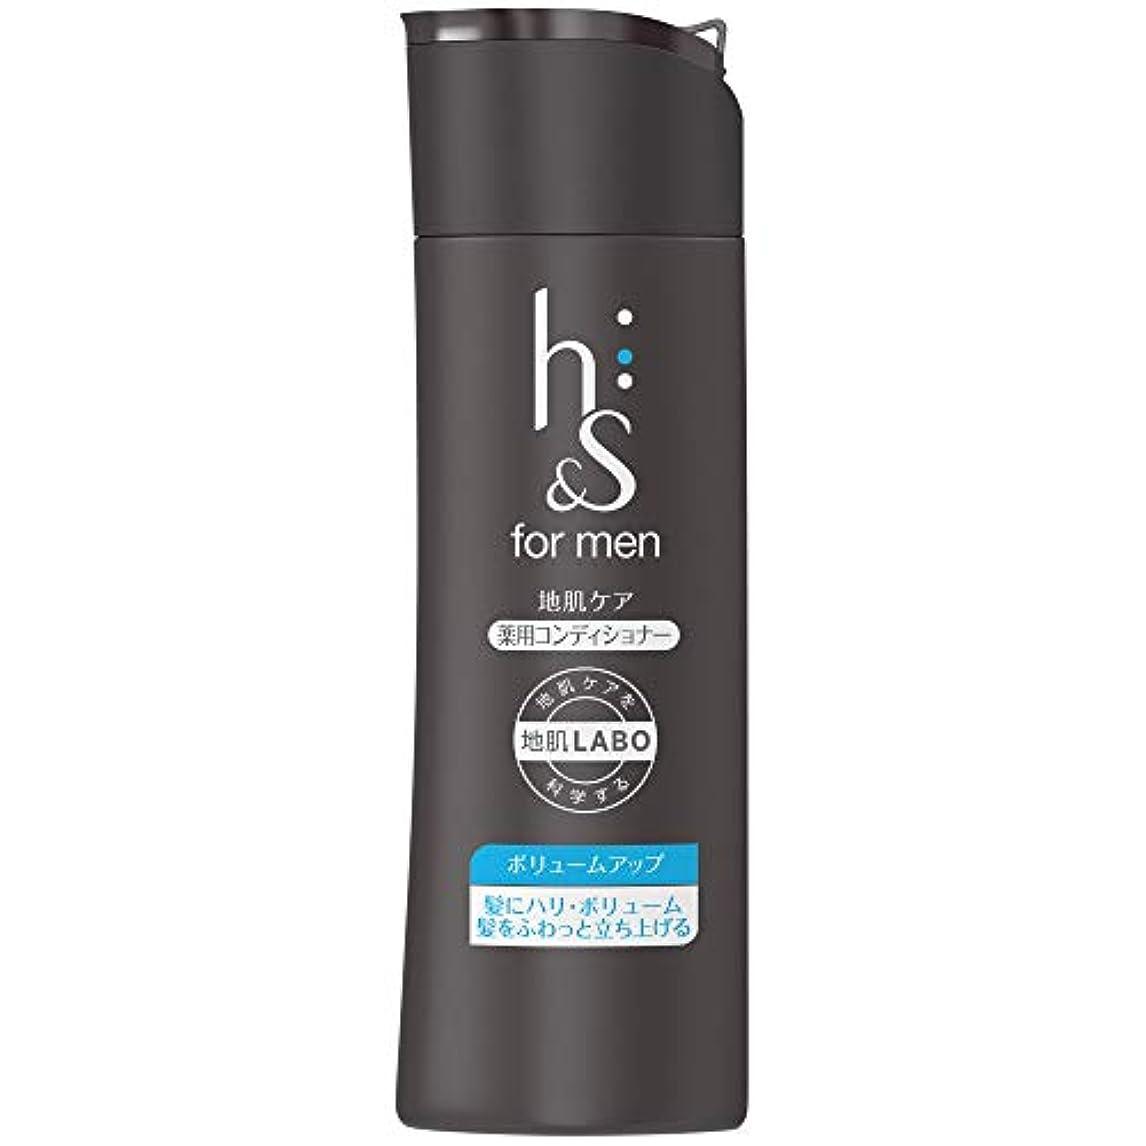 h&s for men コンディショナー ボリュームアップ ボトル 200g